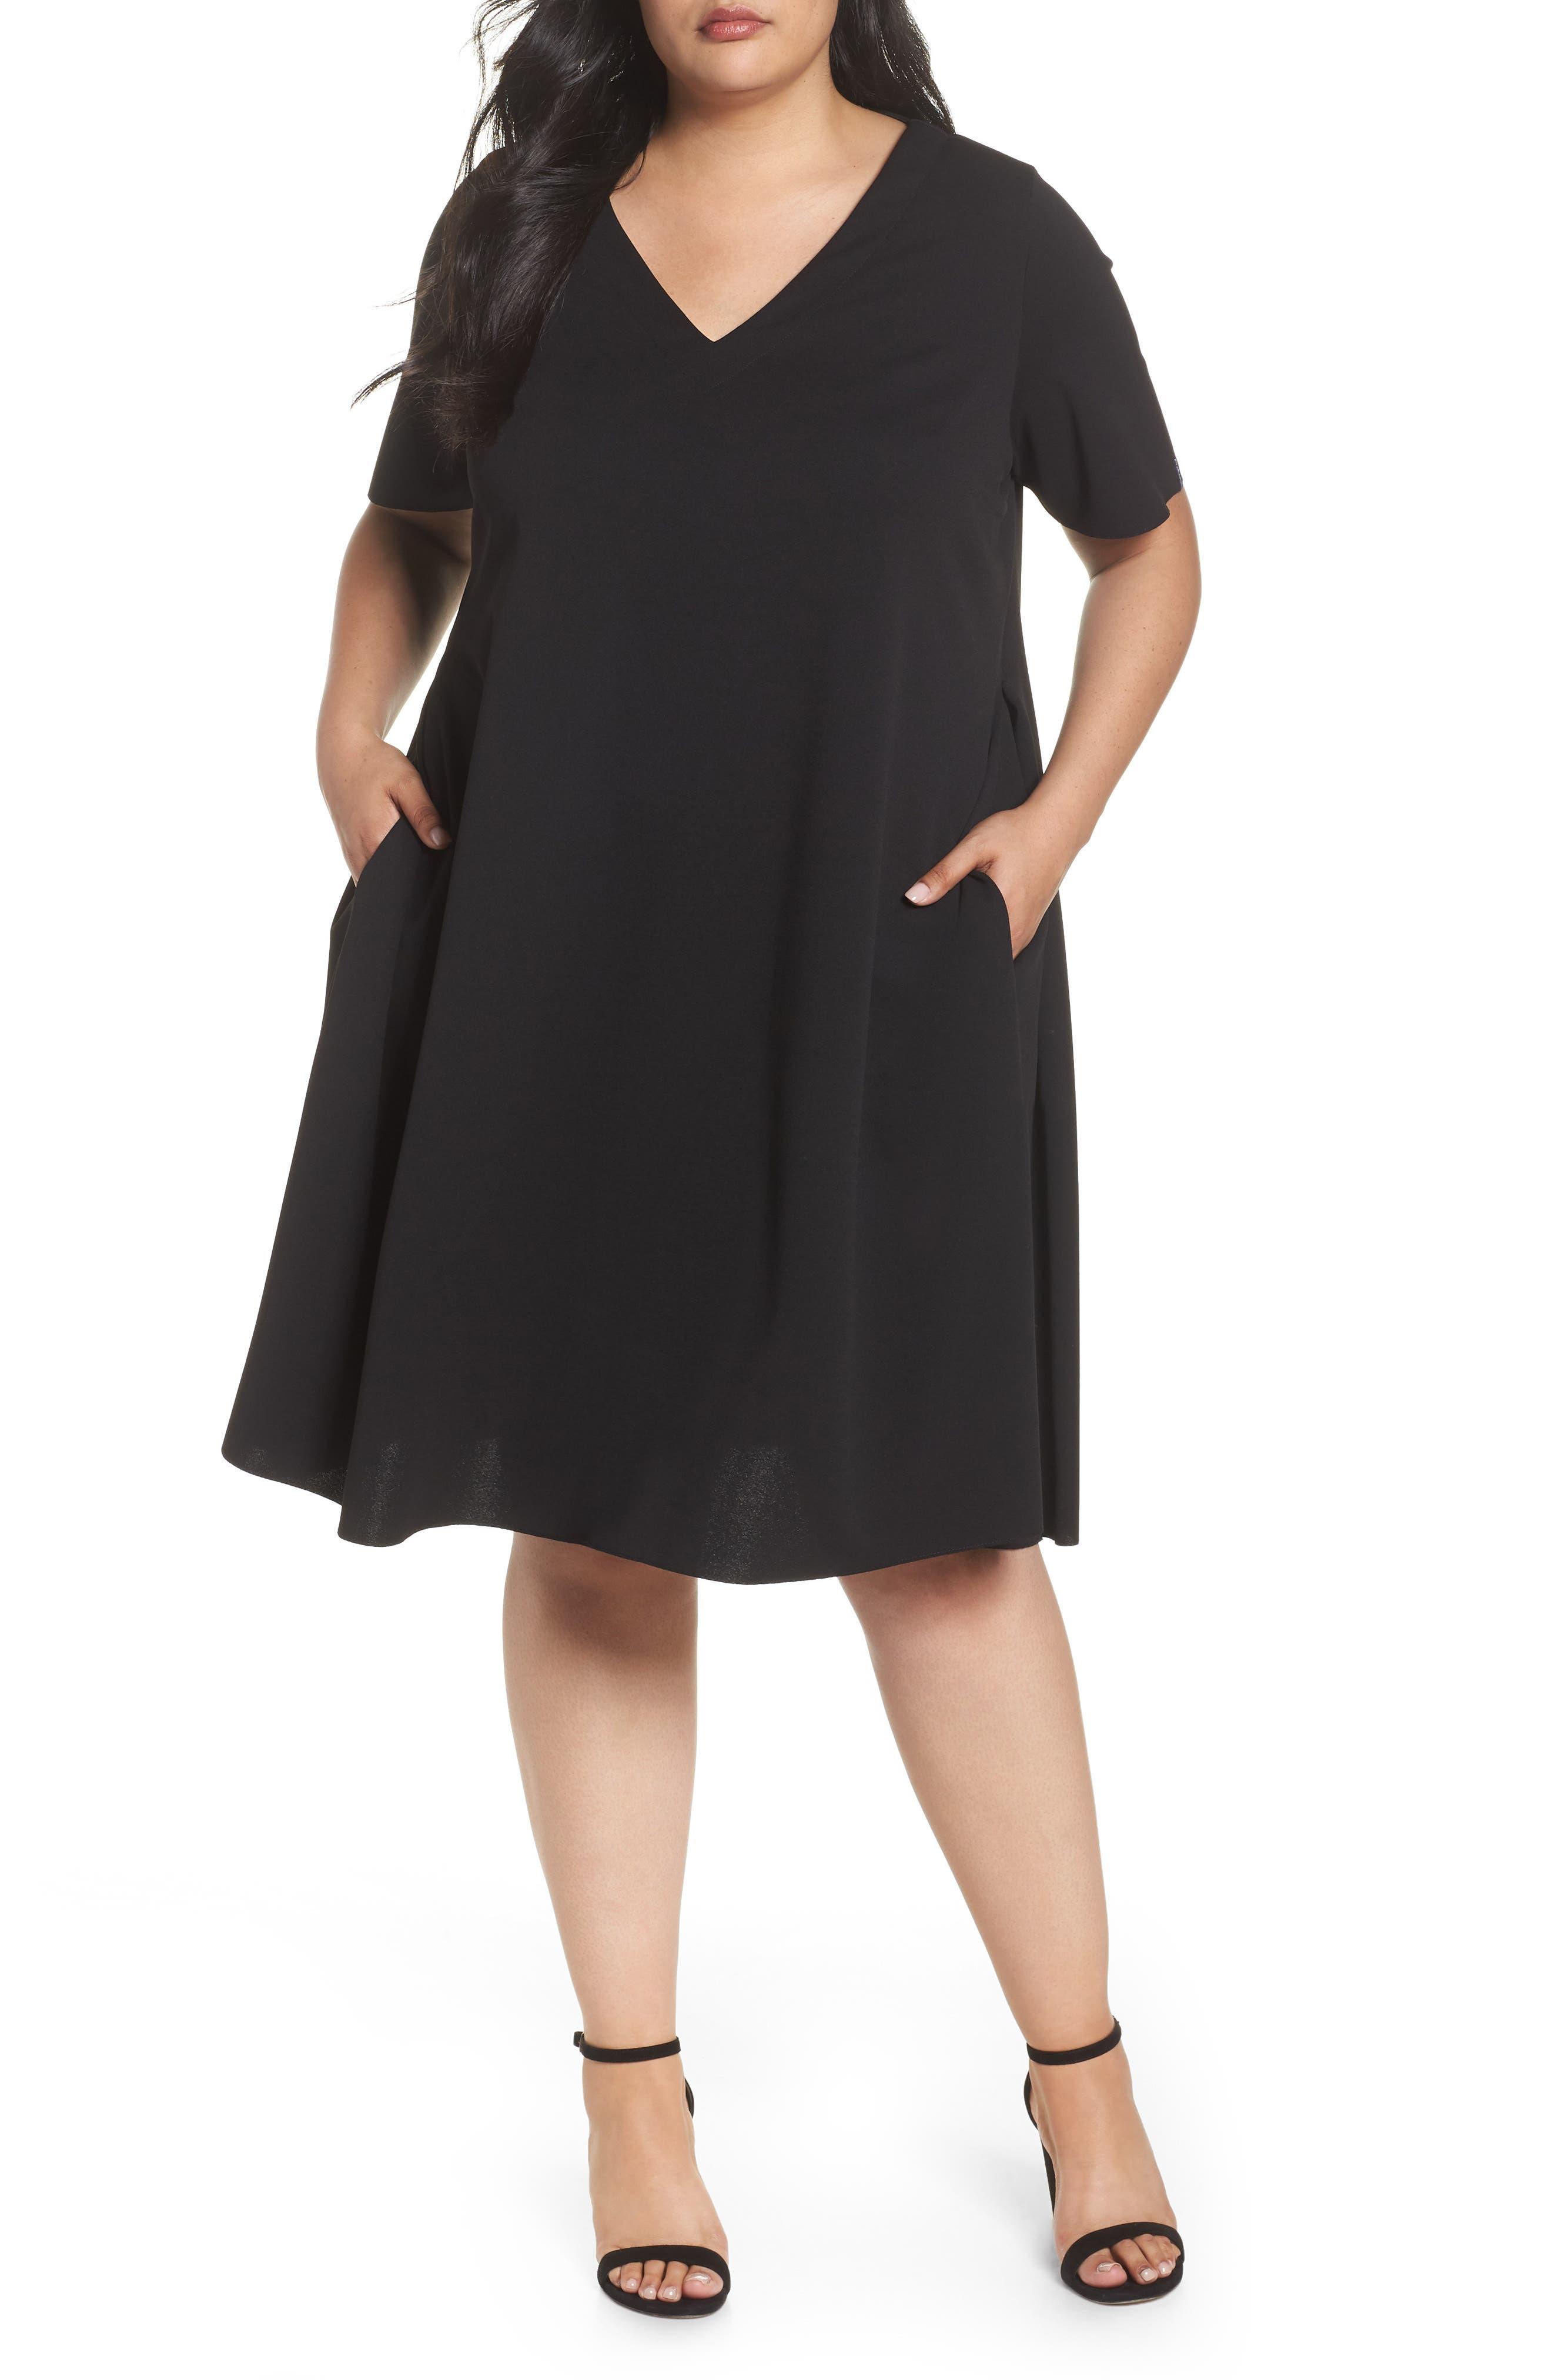 Main Image - Persona by Marina Rinaldi Short Sleeve Knit Dress (Plus Size)